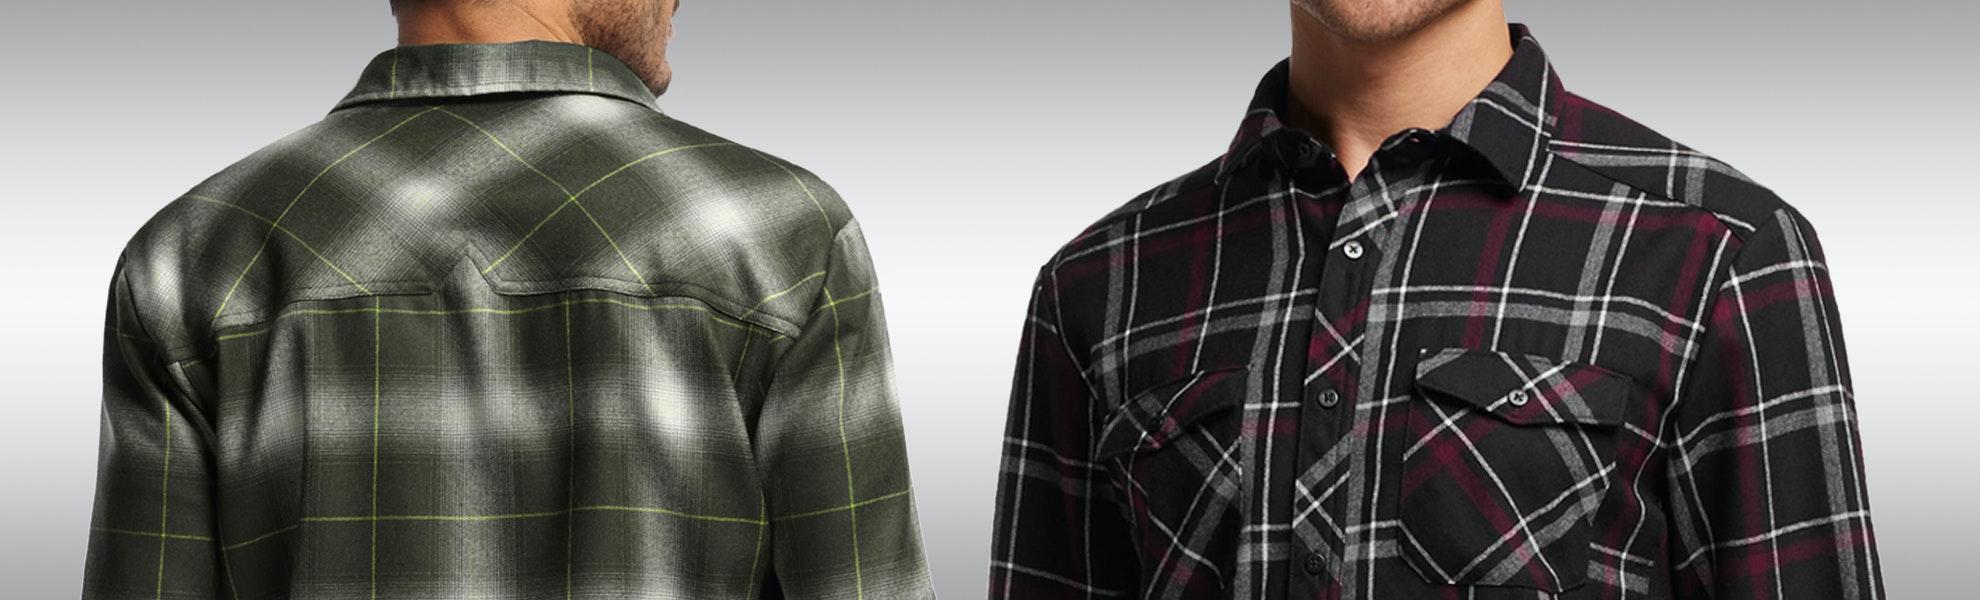 Icebreaker Men's Lodge Plaid & Flannel Shirts